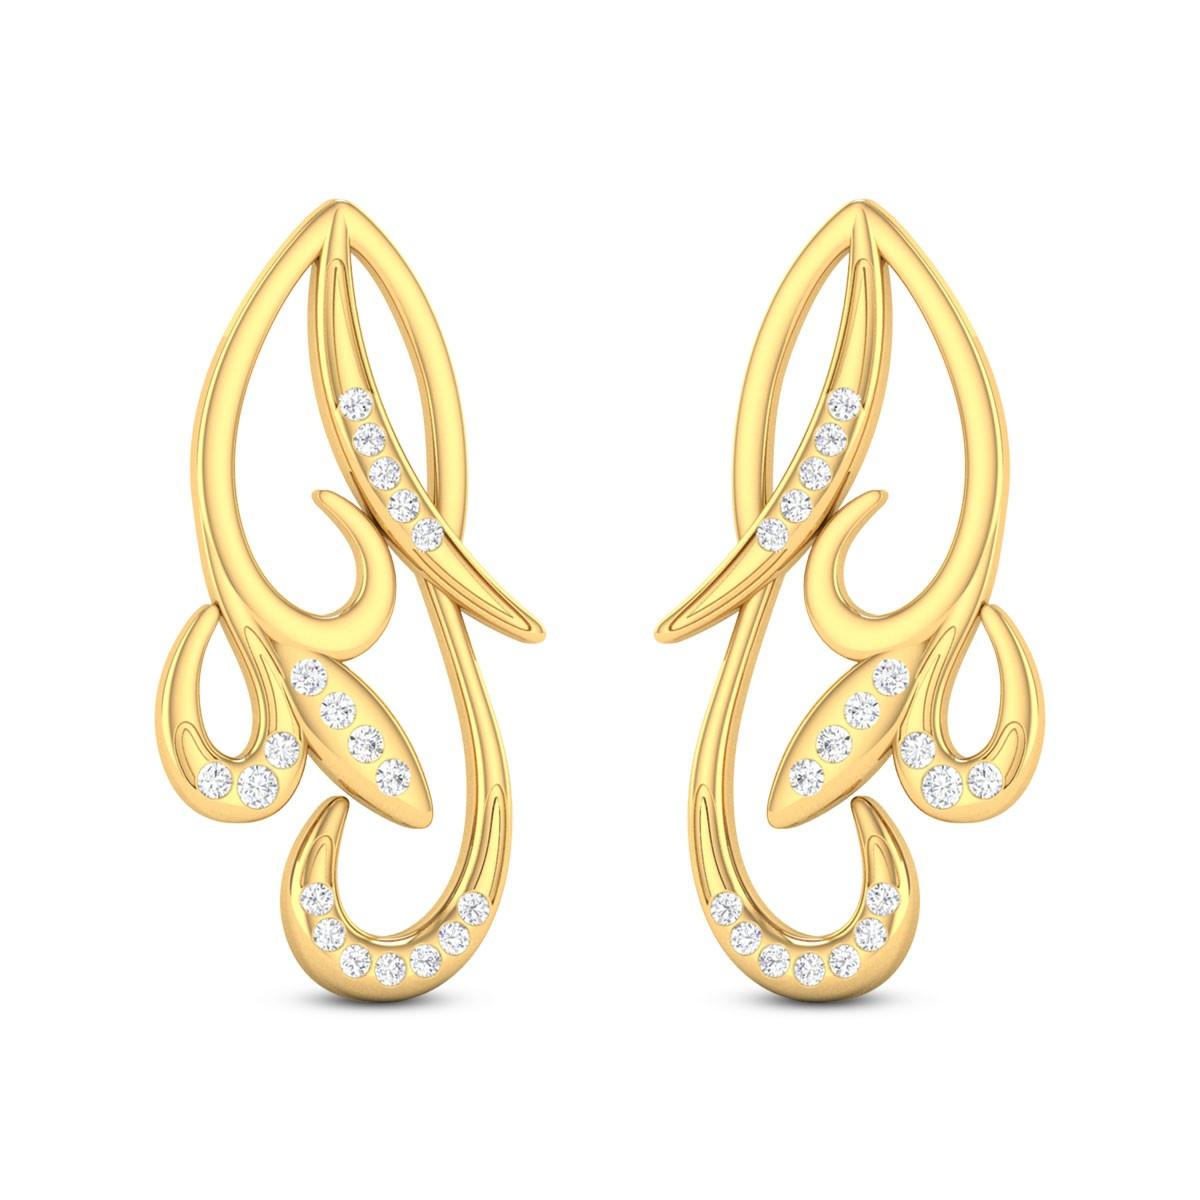 Qiana Floral Diamond Stud Earrings